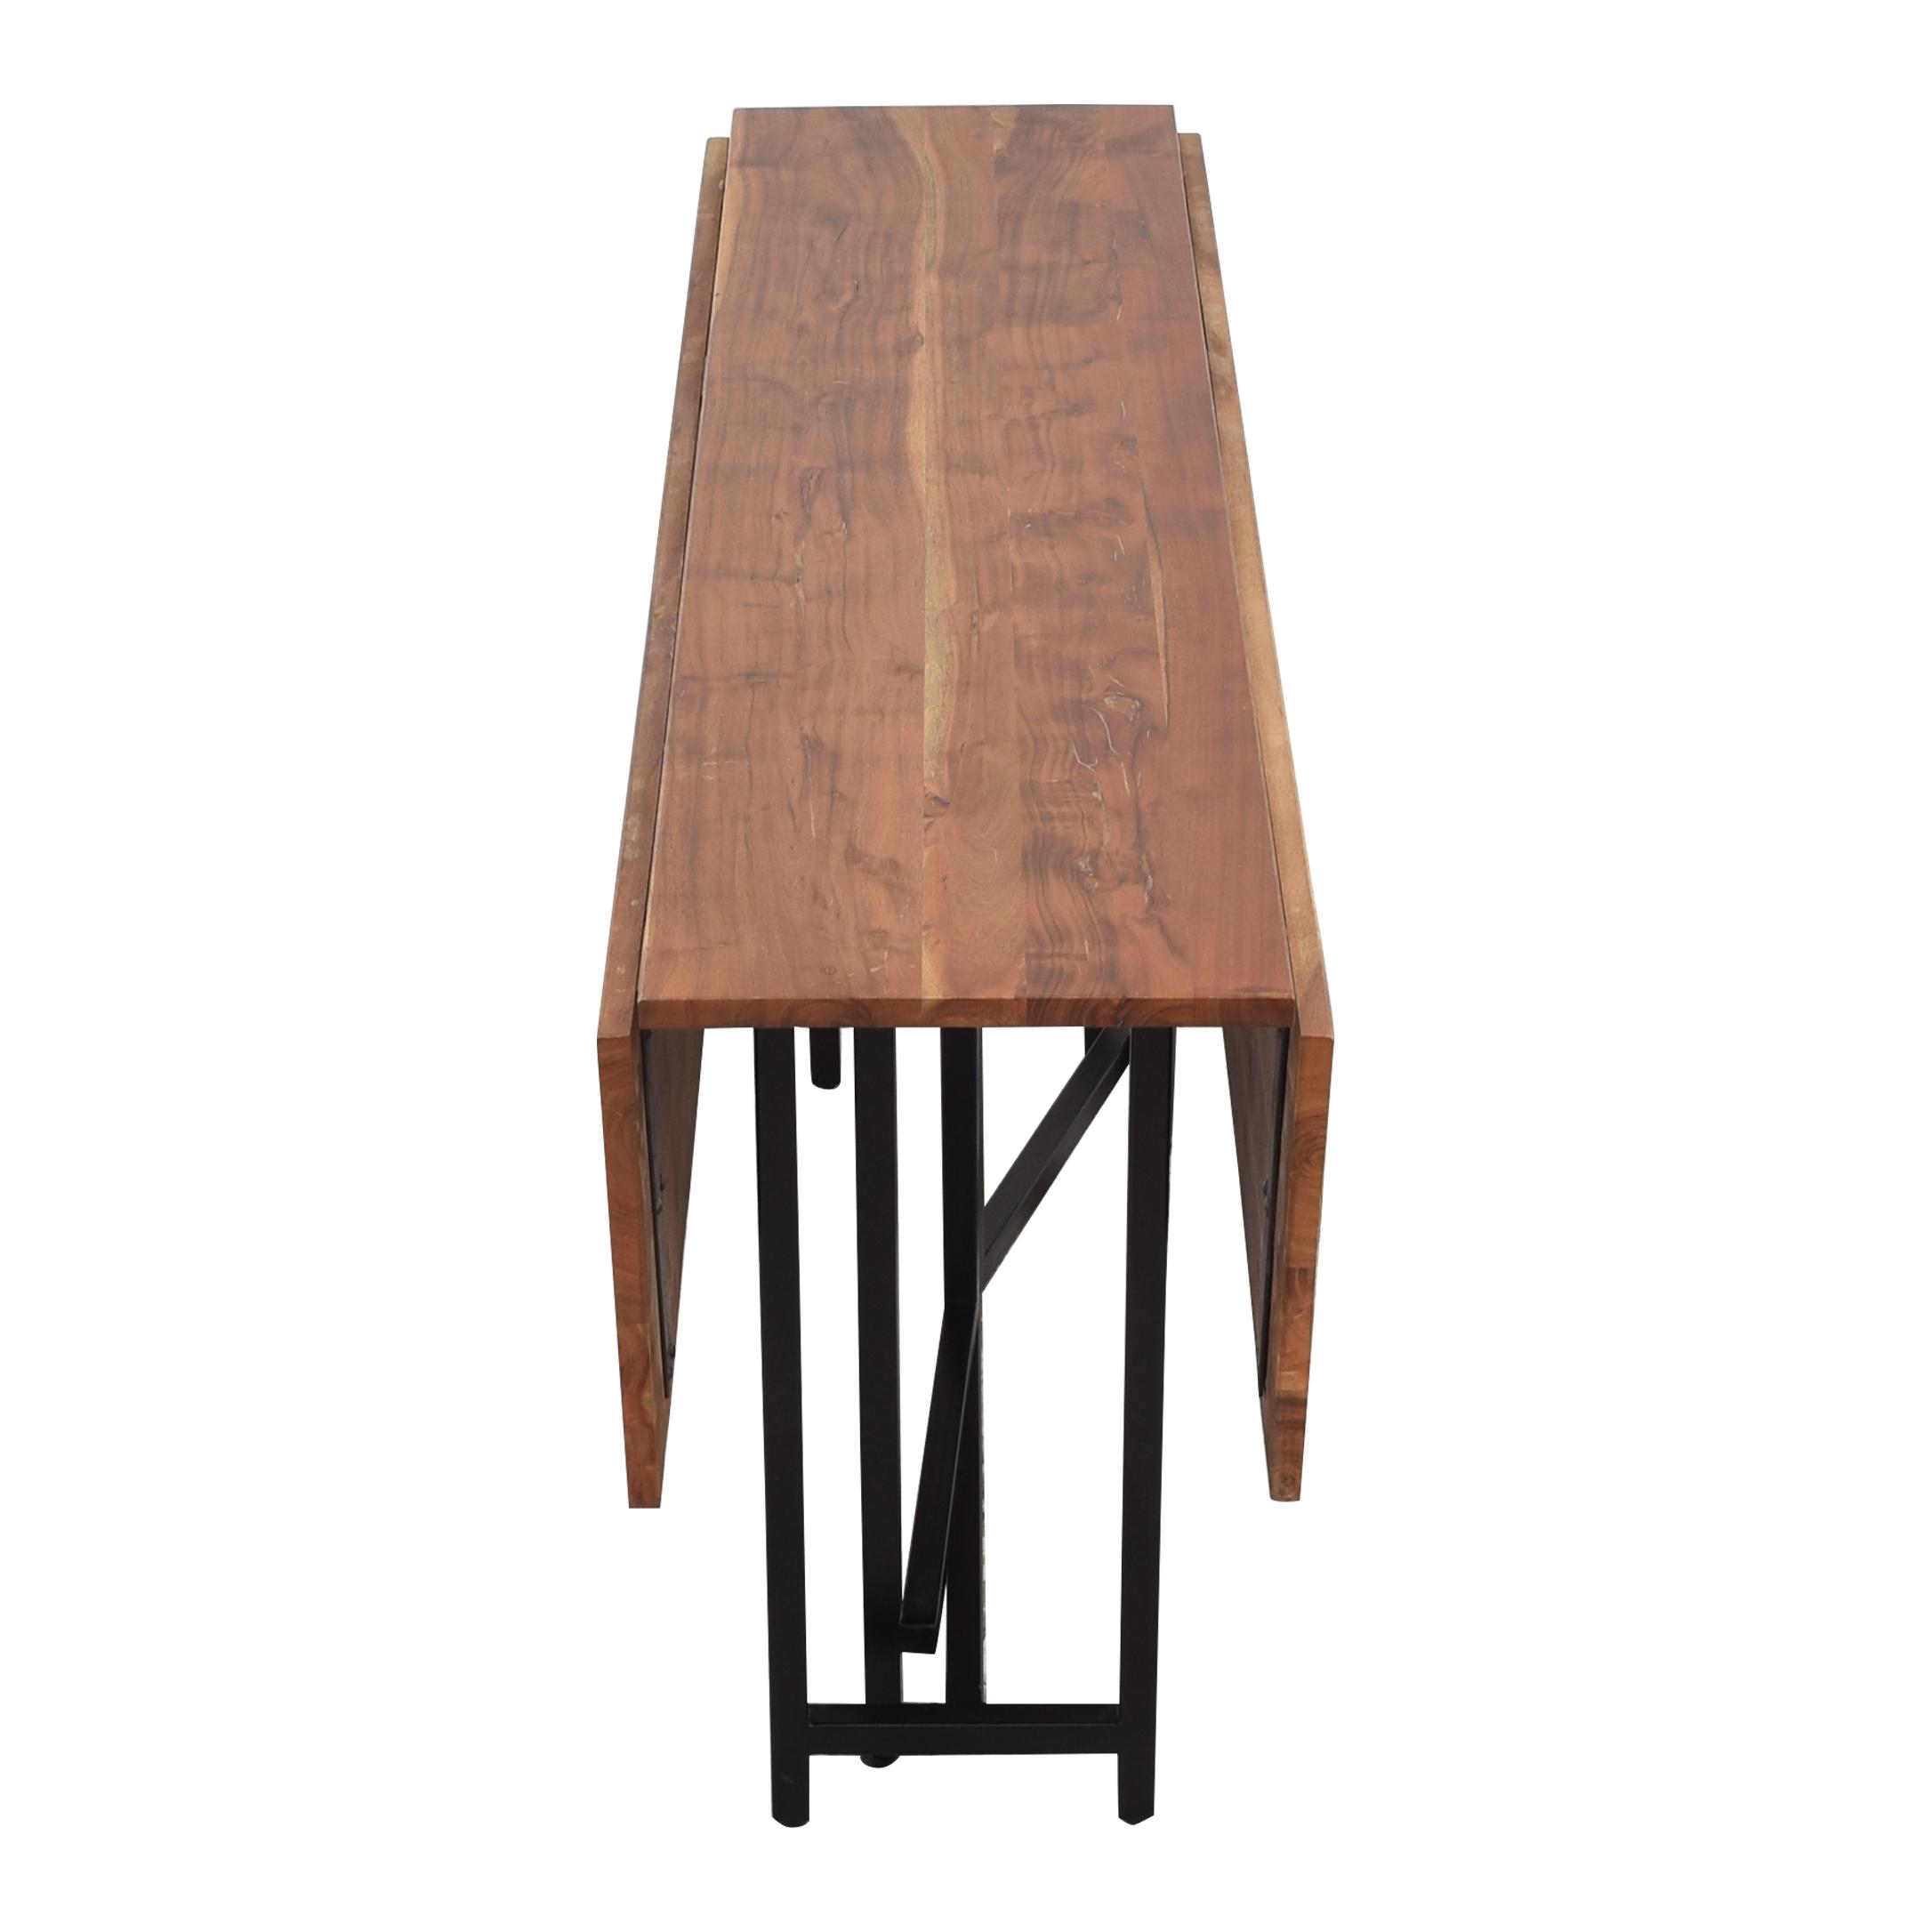 buy Crate & Barrel Origami Drop Leaf Rectangular Dining Table Crate & Barrel Dinner Tables